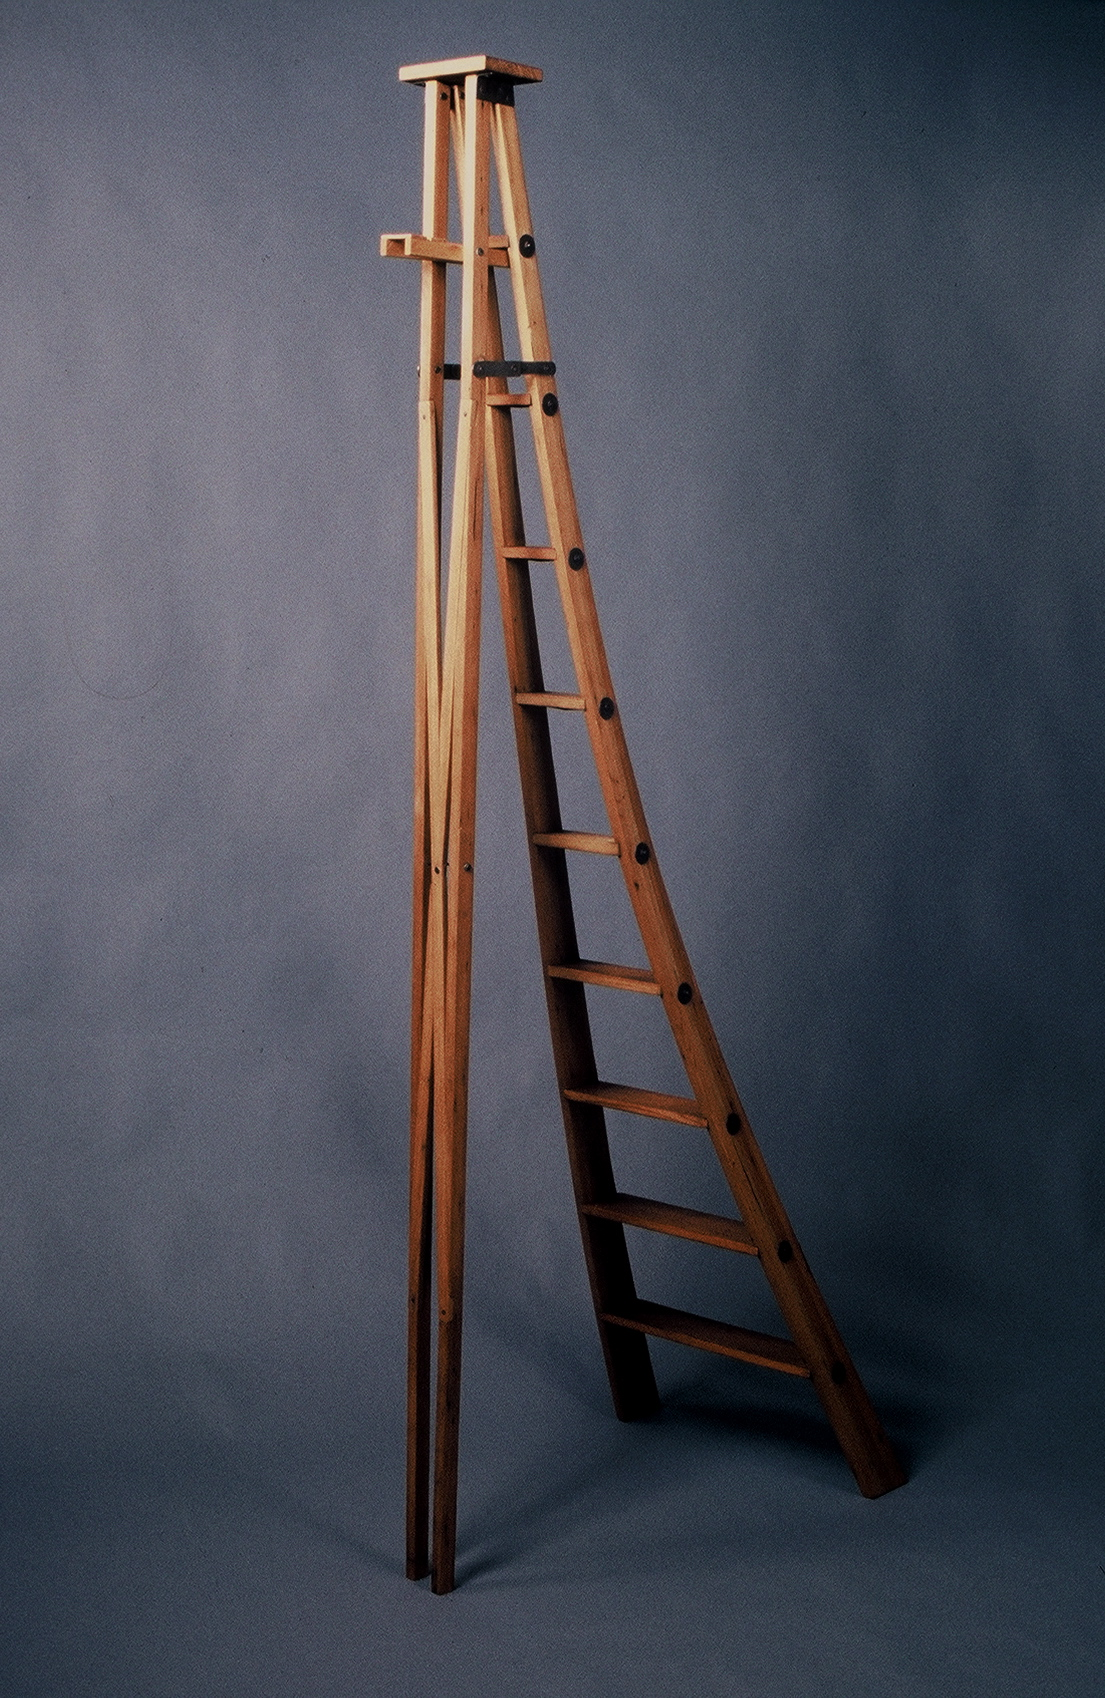 Ladder #2